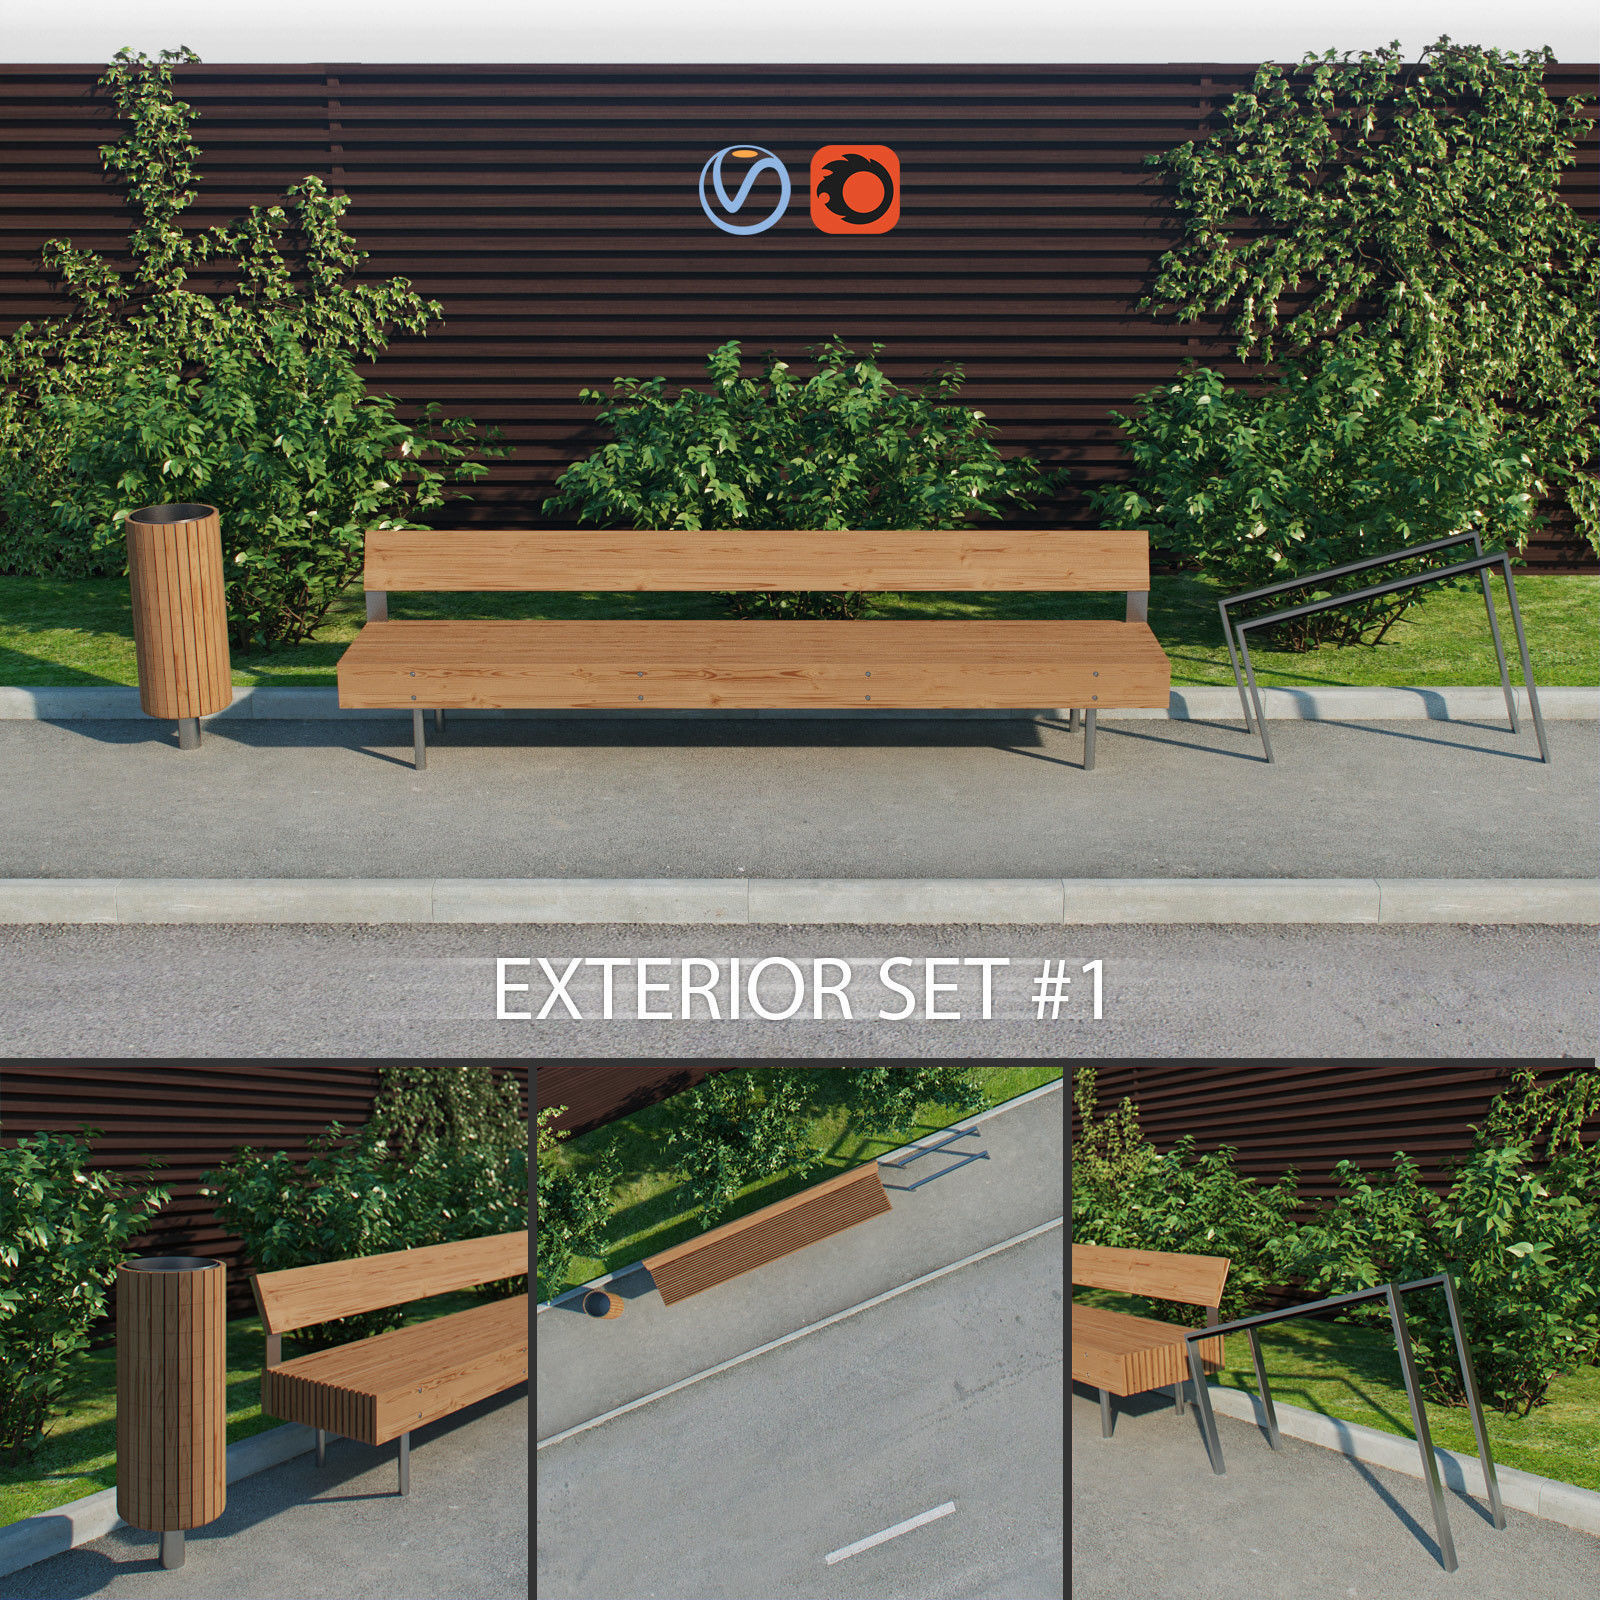 Exterior set 1 - Woody LWD150 - Nanuk NNK110 - Edgetyre STE110